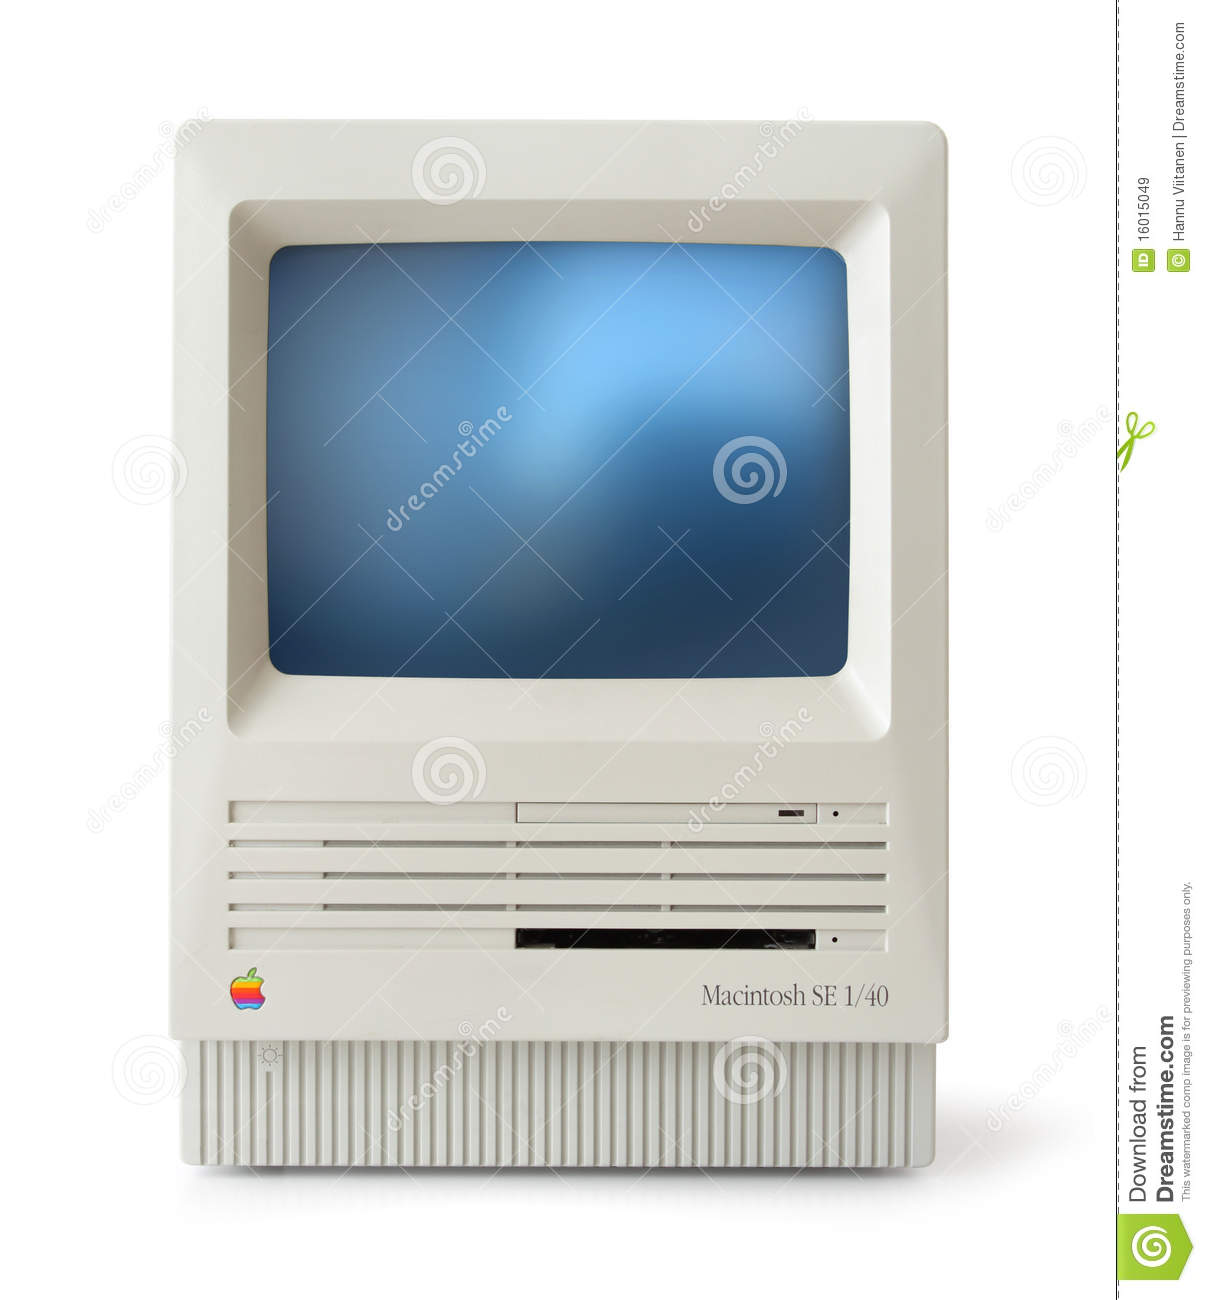 Clip Art Clip Art For Mac macintosh clipart kid classic mac se front editorial stock image 16015049